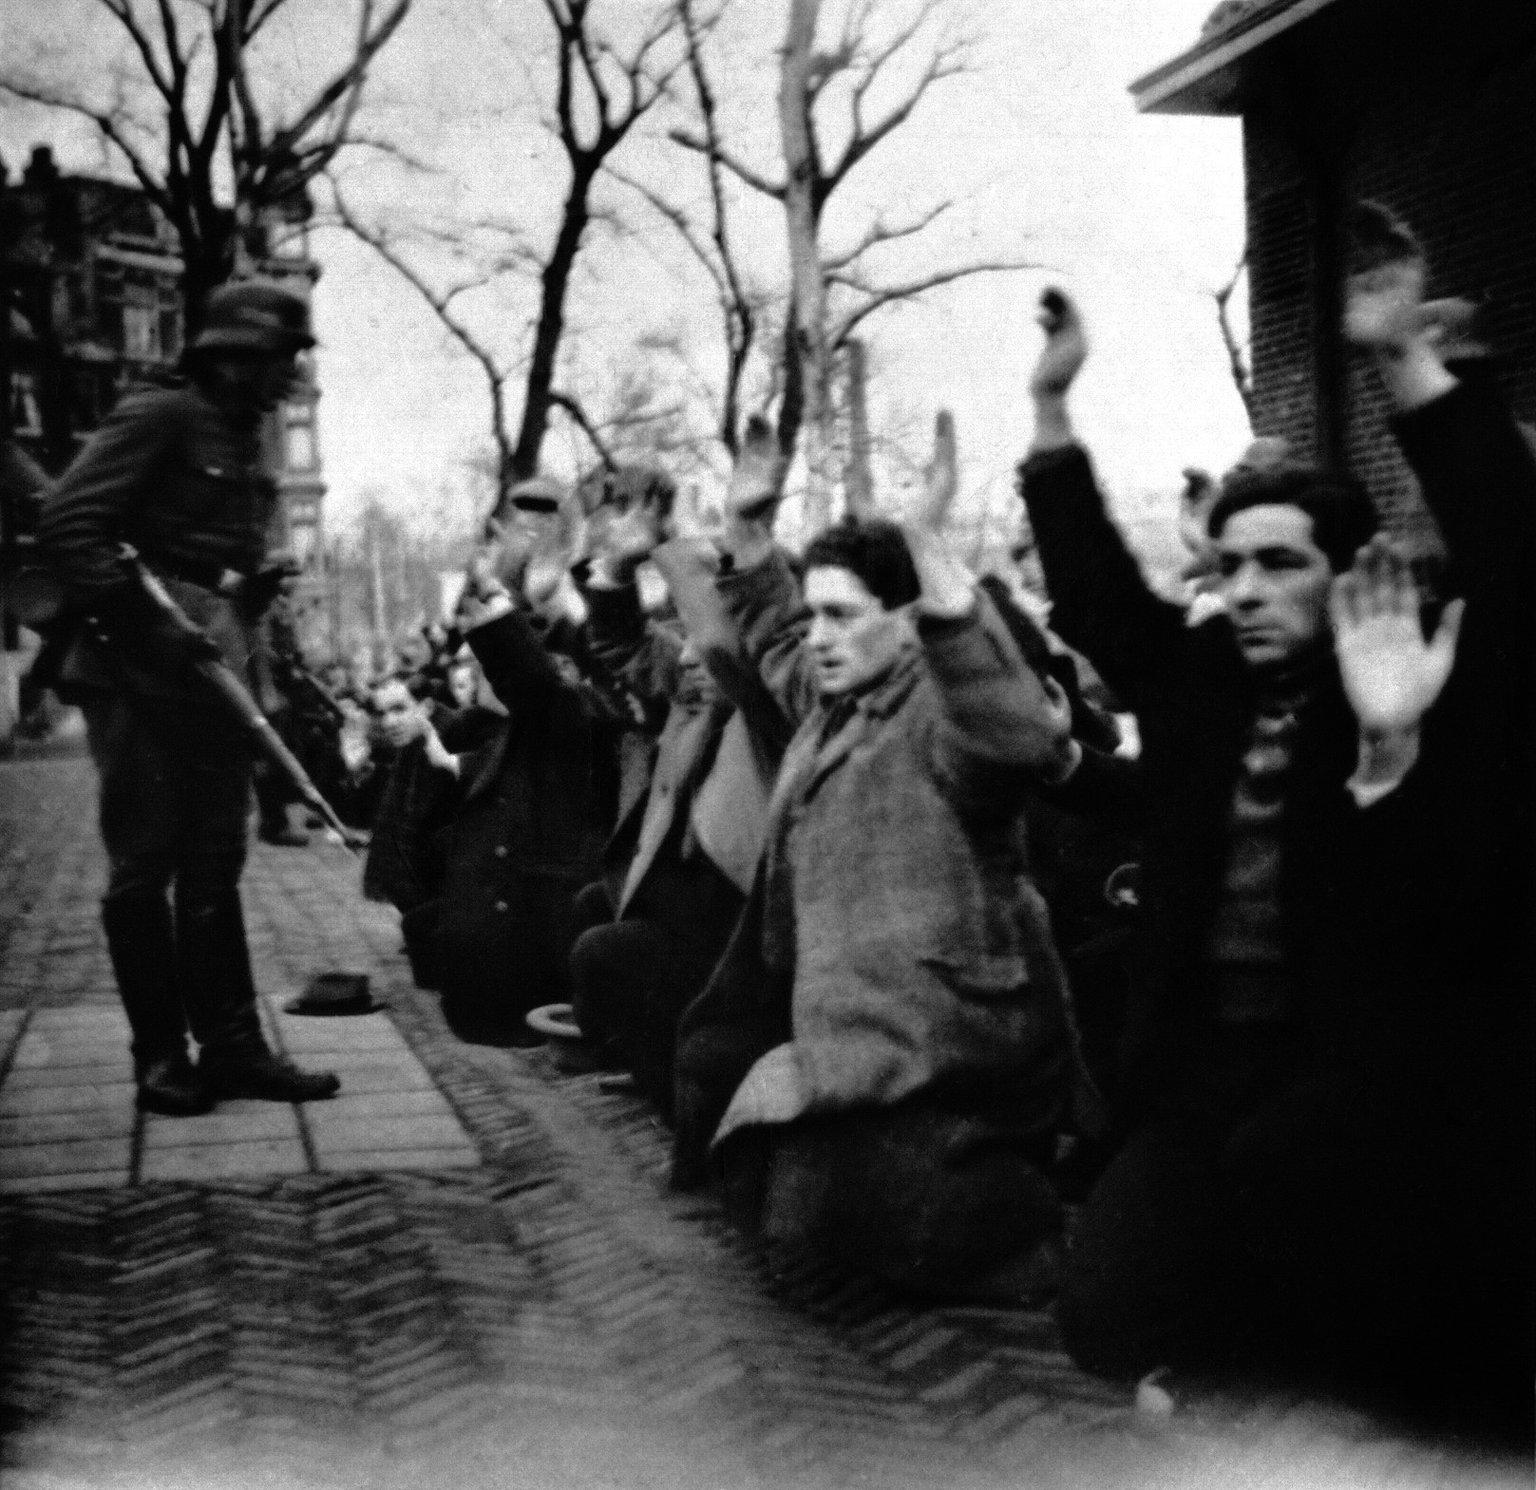 Razzia op Jonas Daniël Meijerplein. Amsterdam, 22 of 23 februari 1941